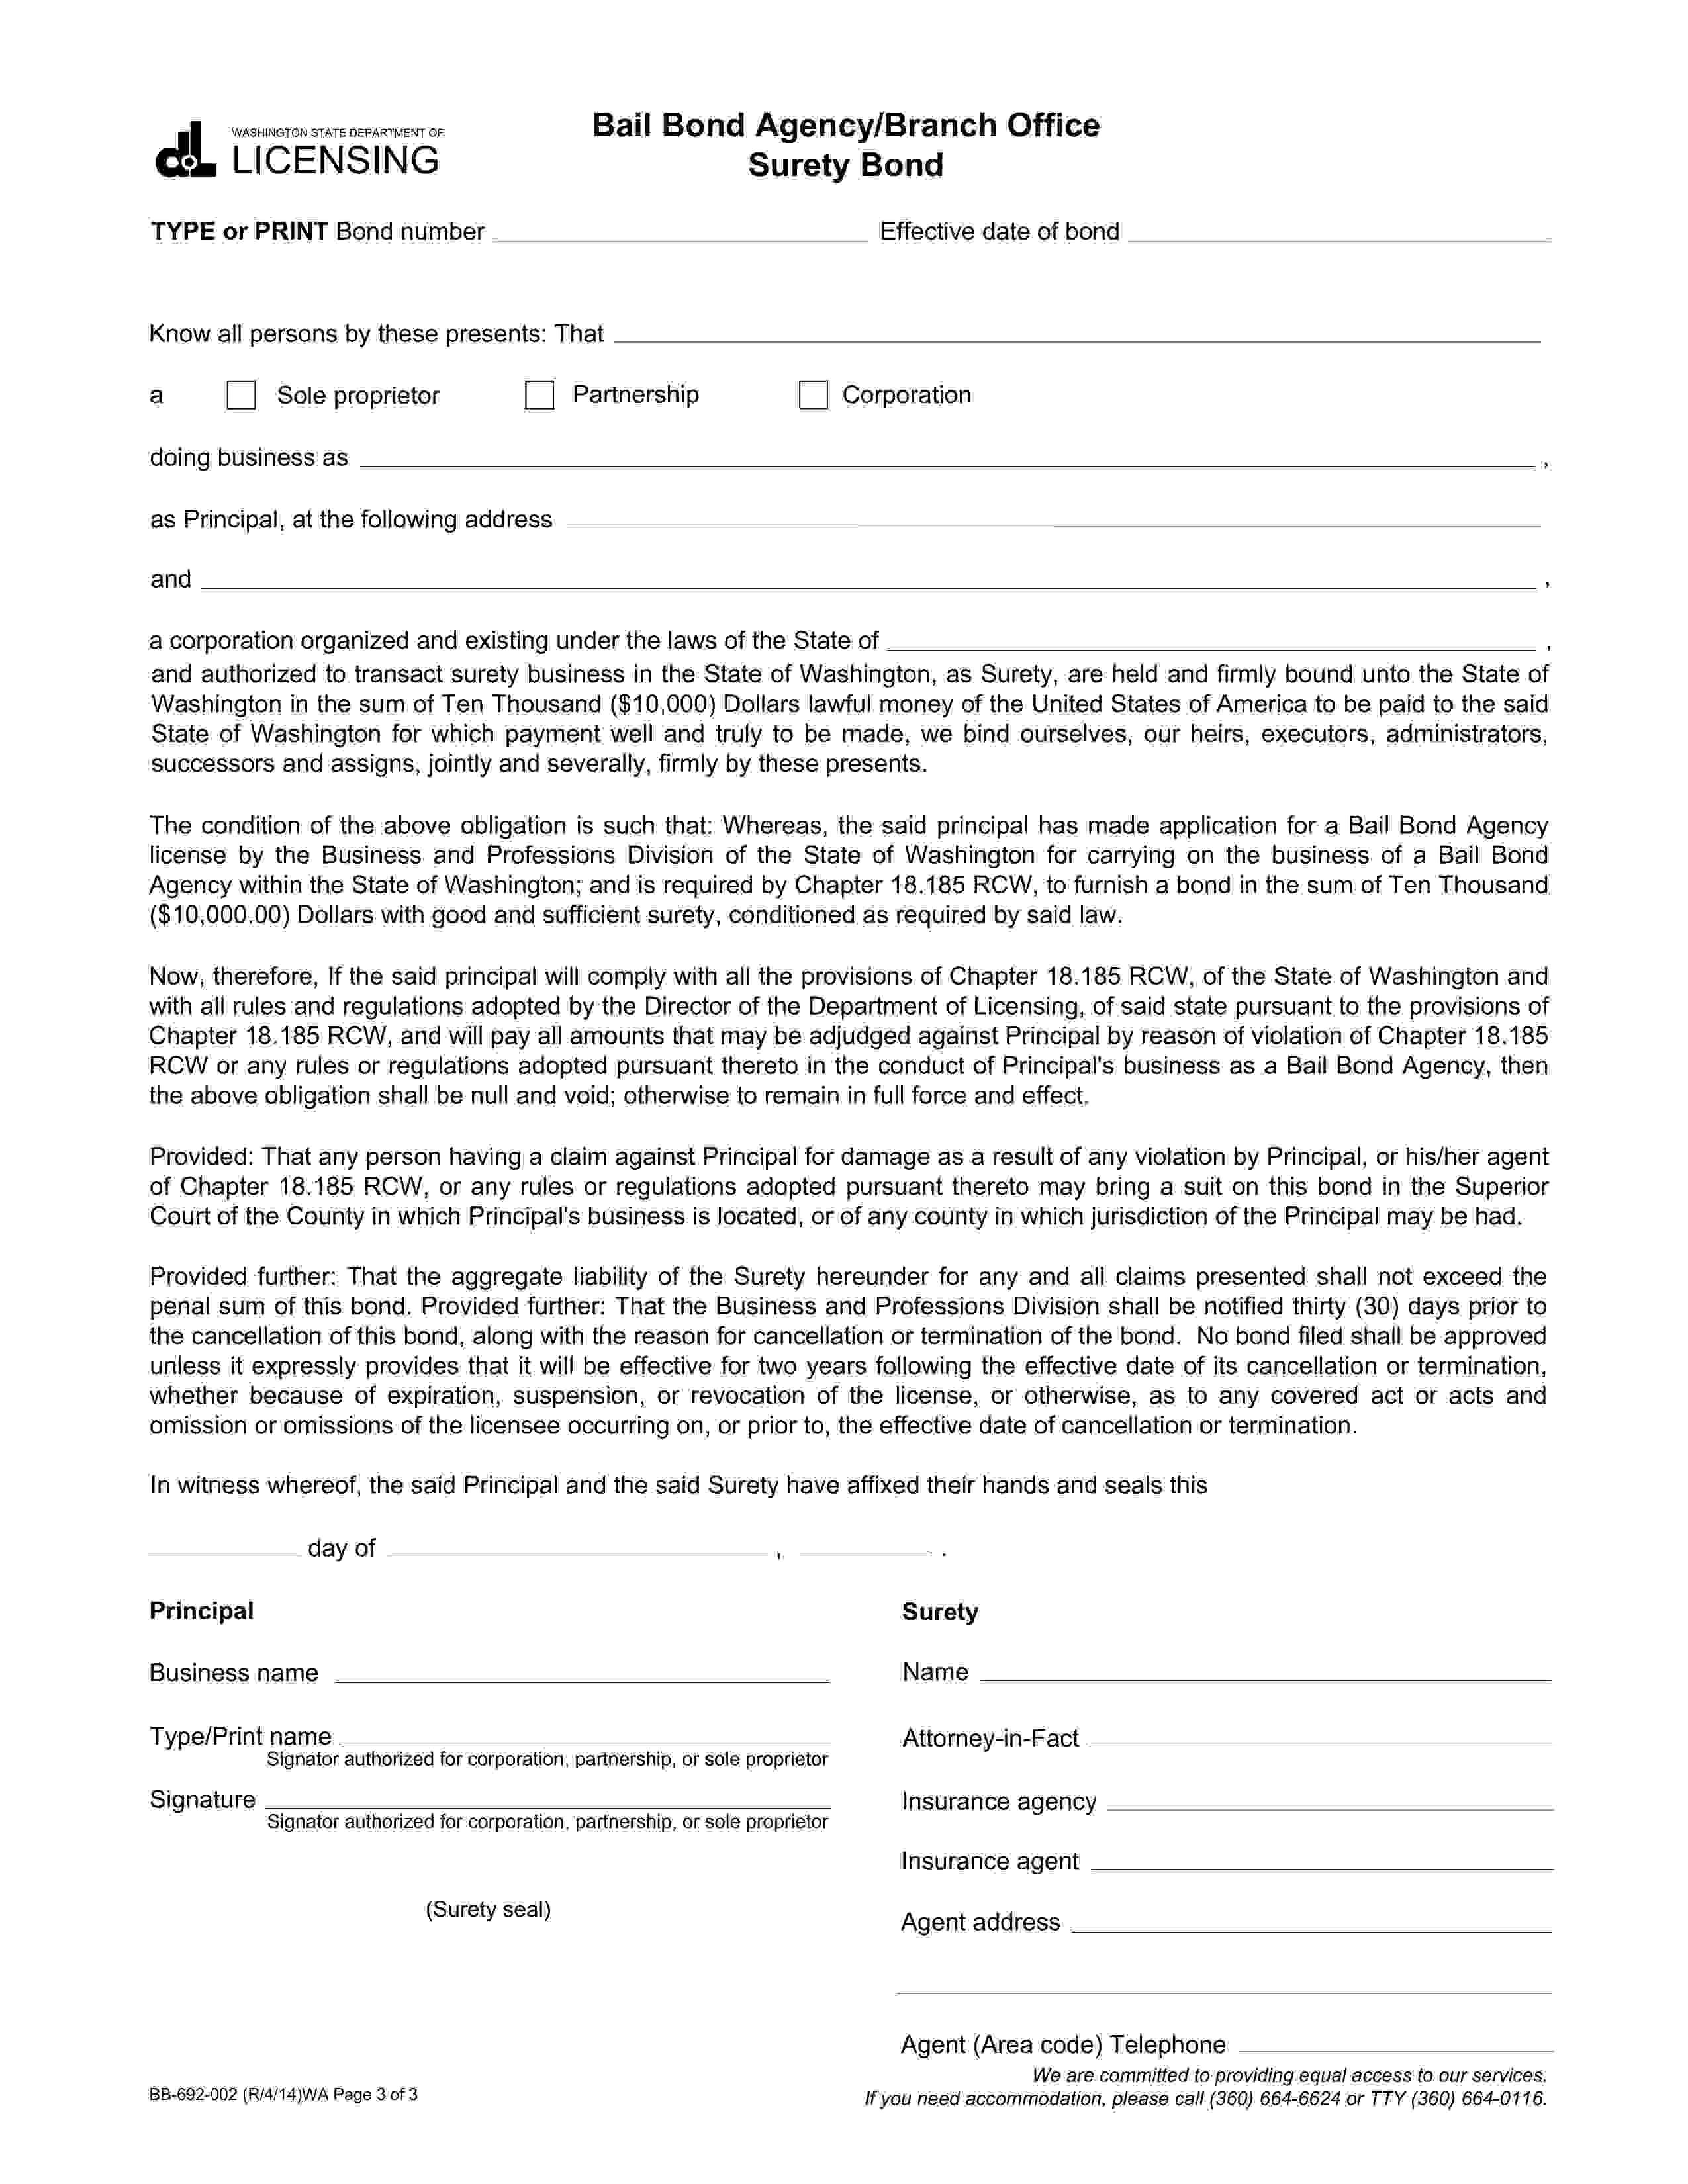 Bail Bond Agency (Corporation) sample image